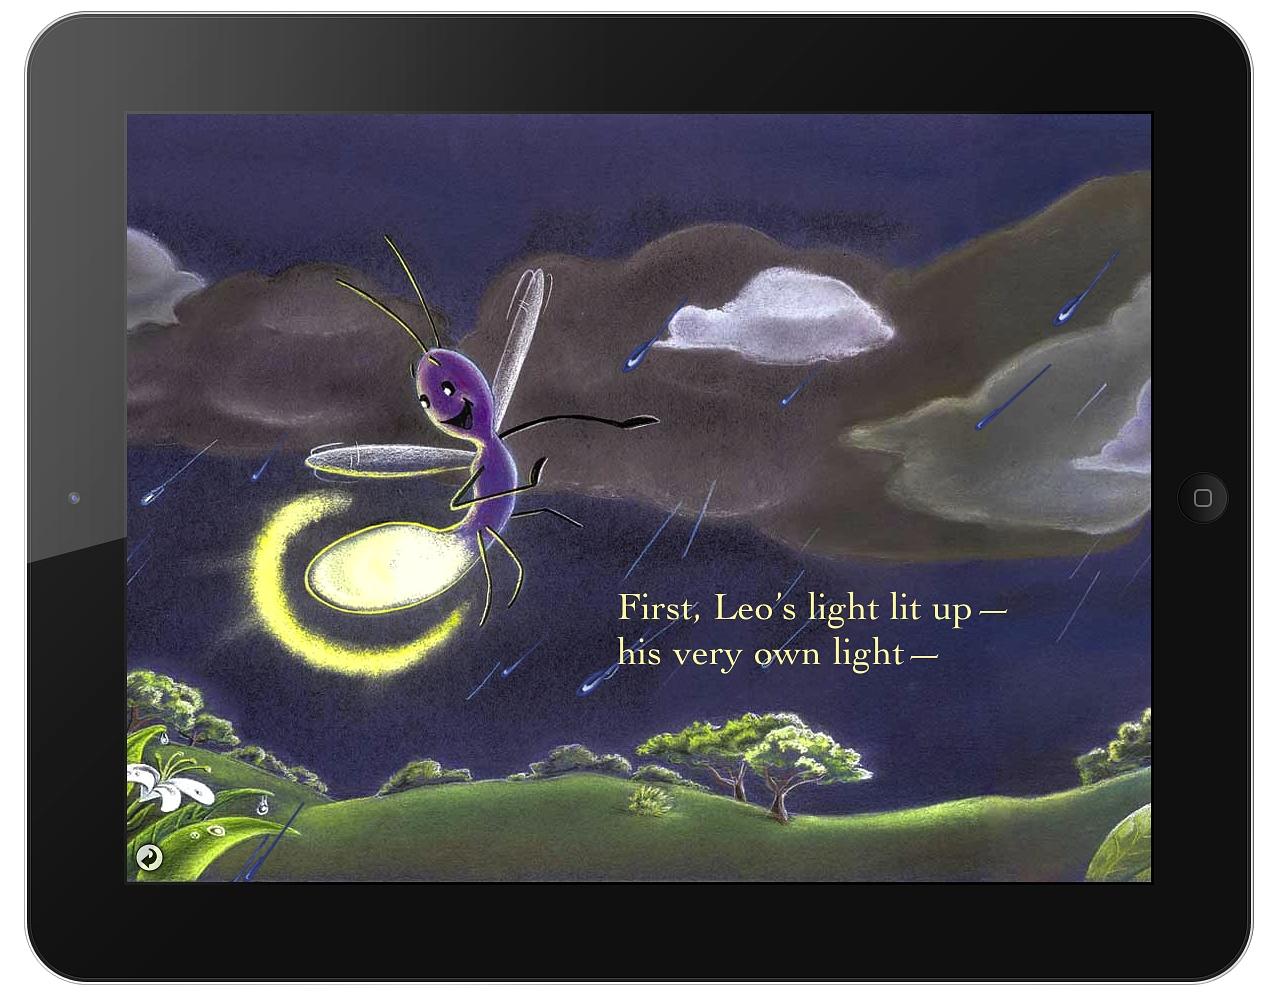 Leo The Lightning Bug Arrives On The App Market From